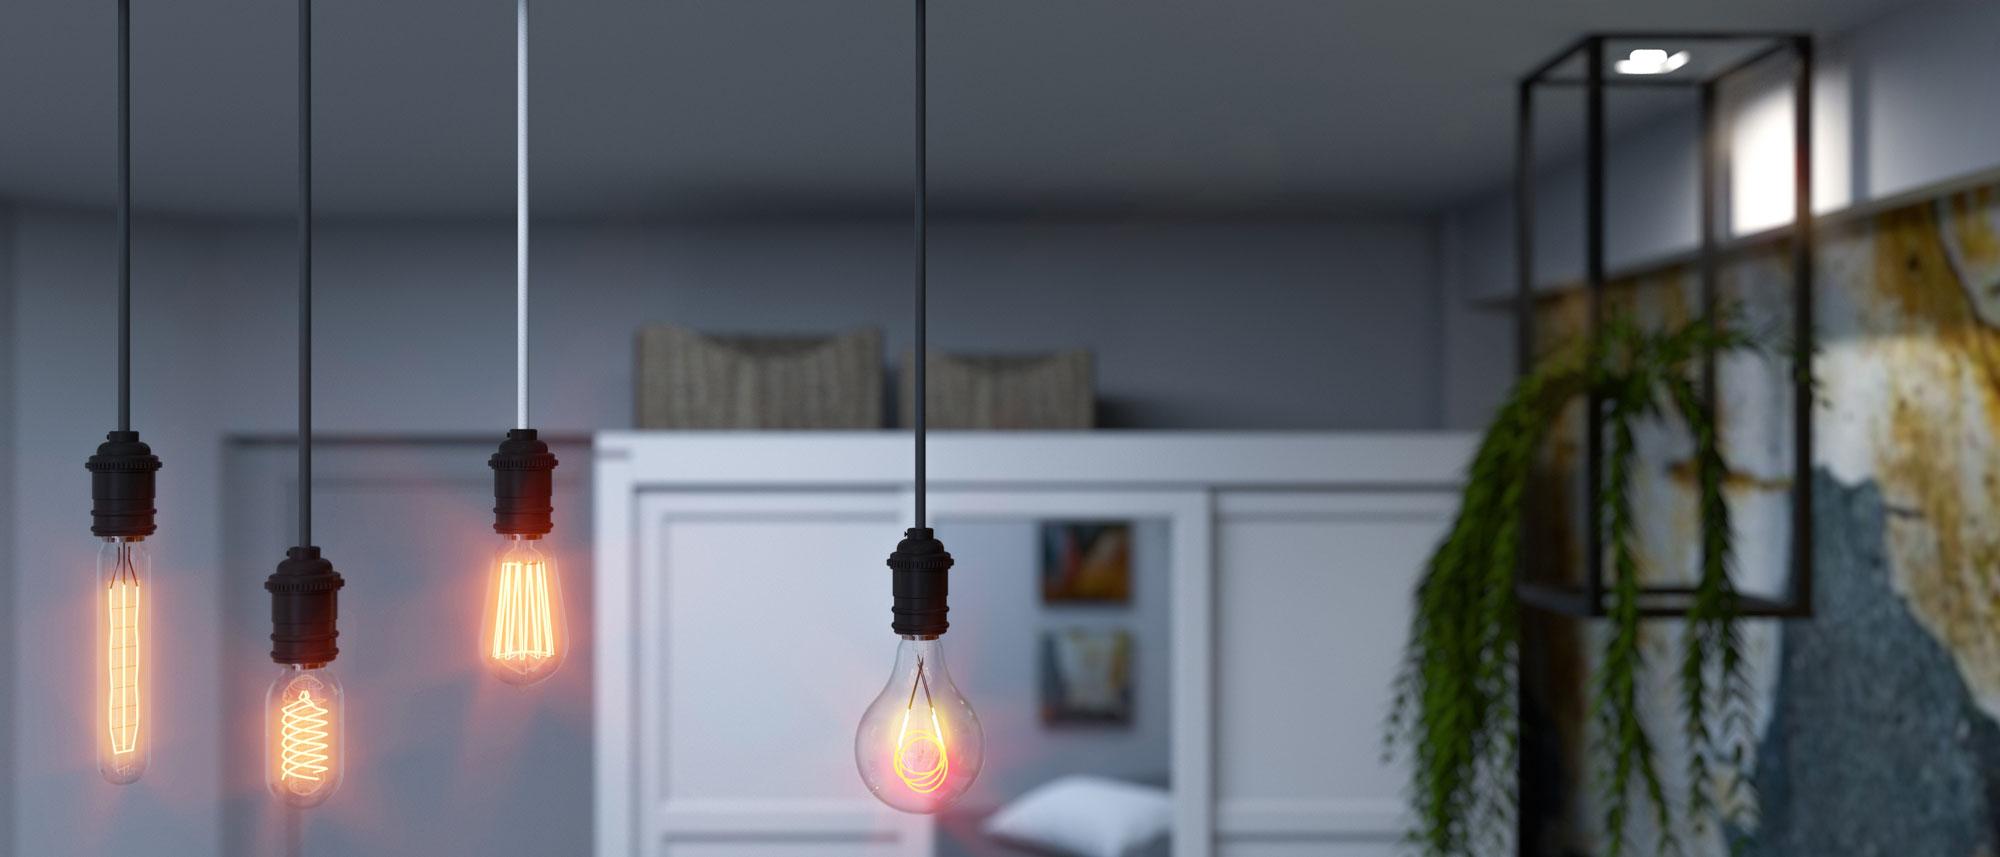 Light bulbs - Bitopia 3D rendering studio